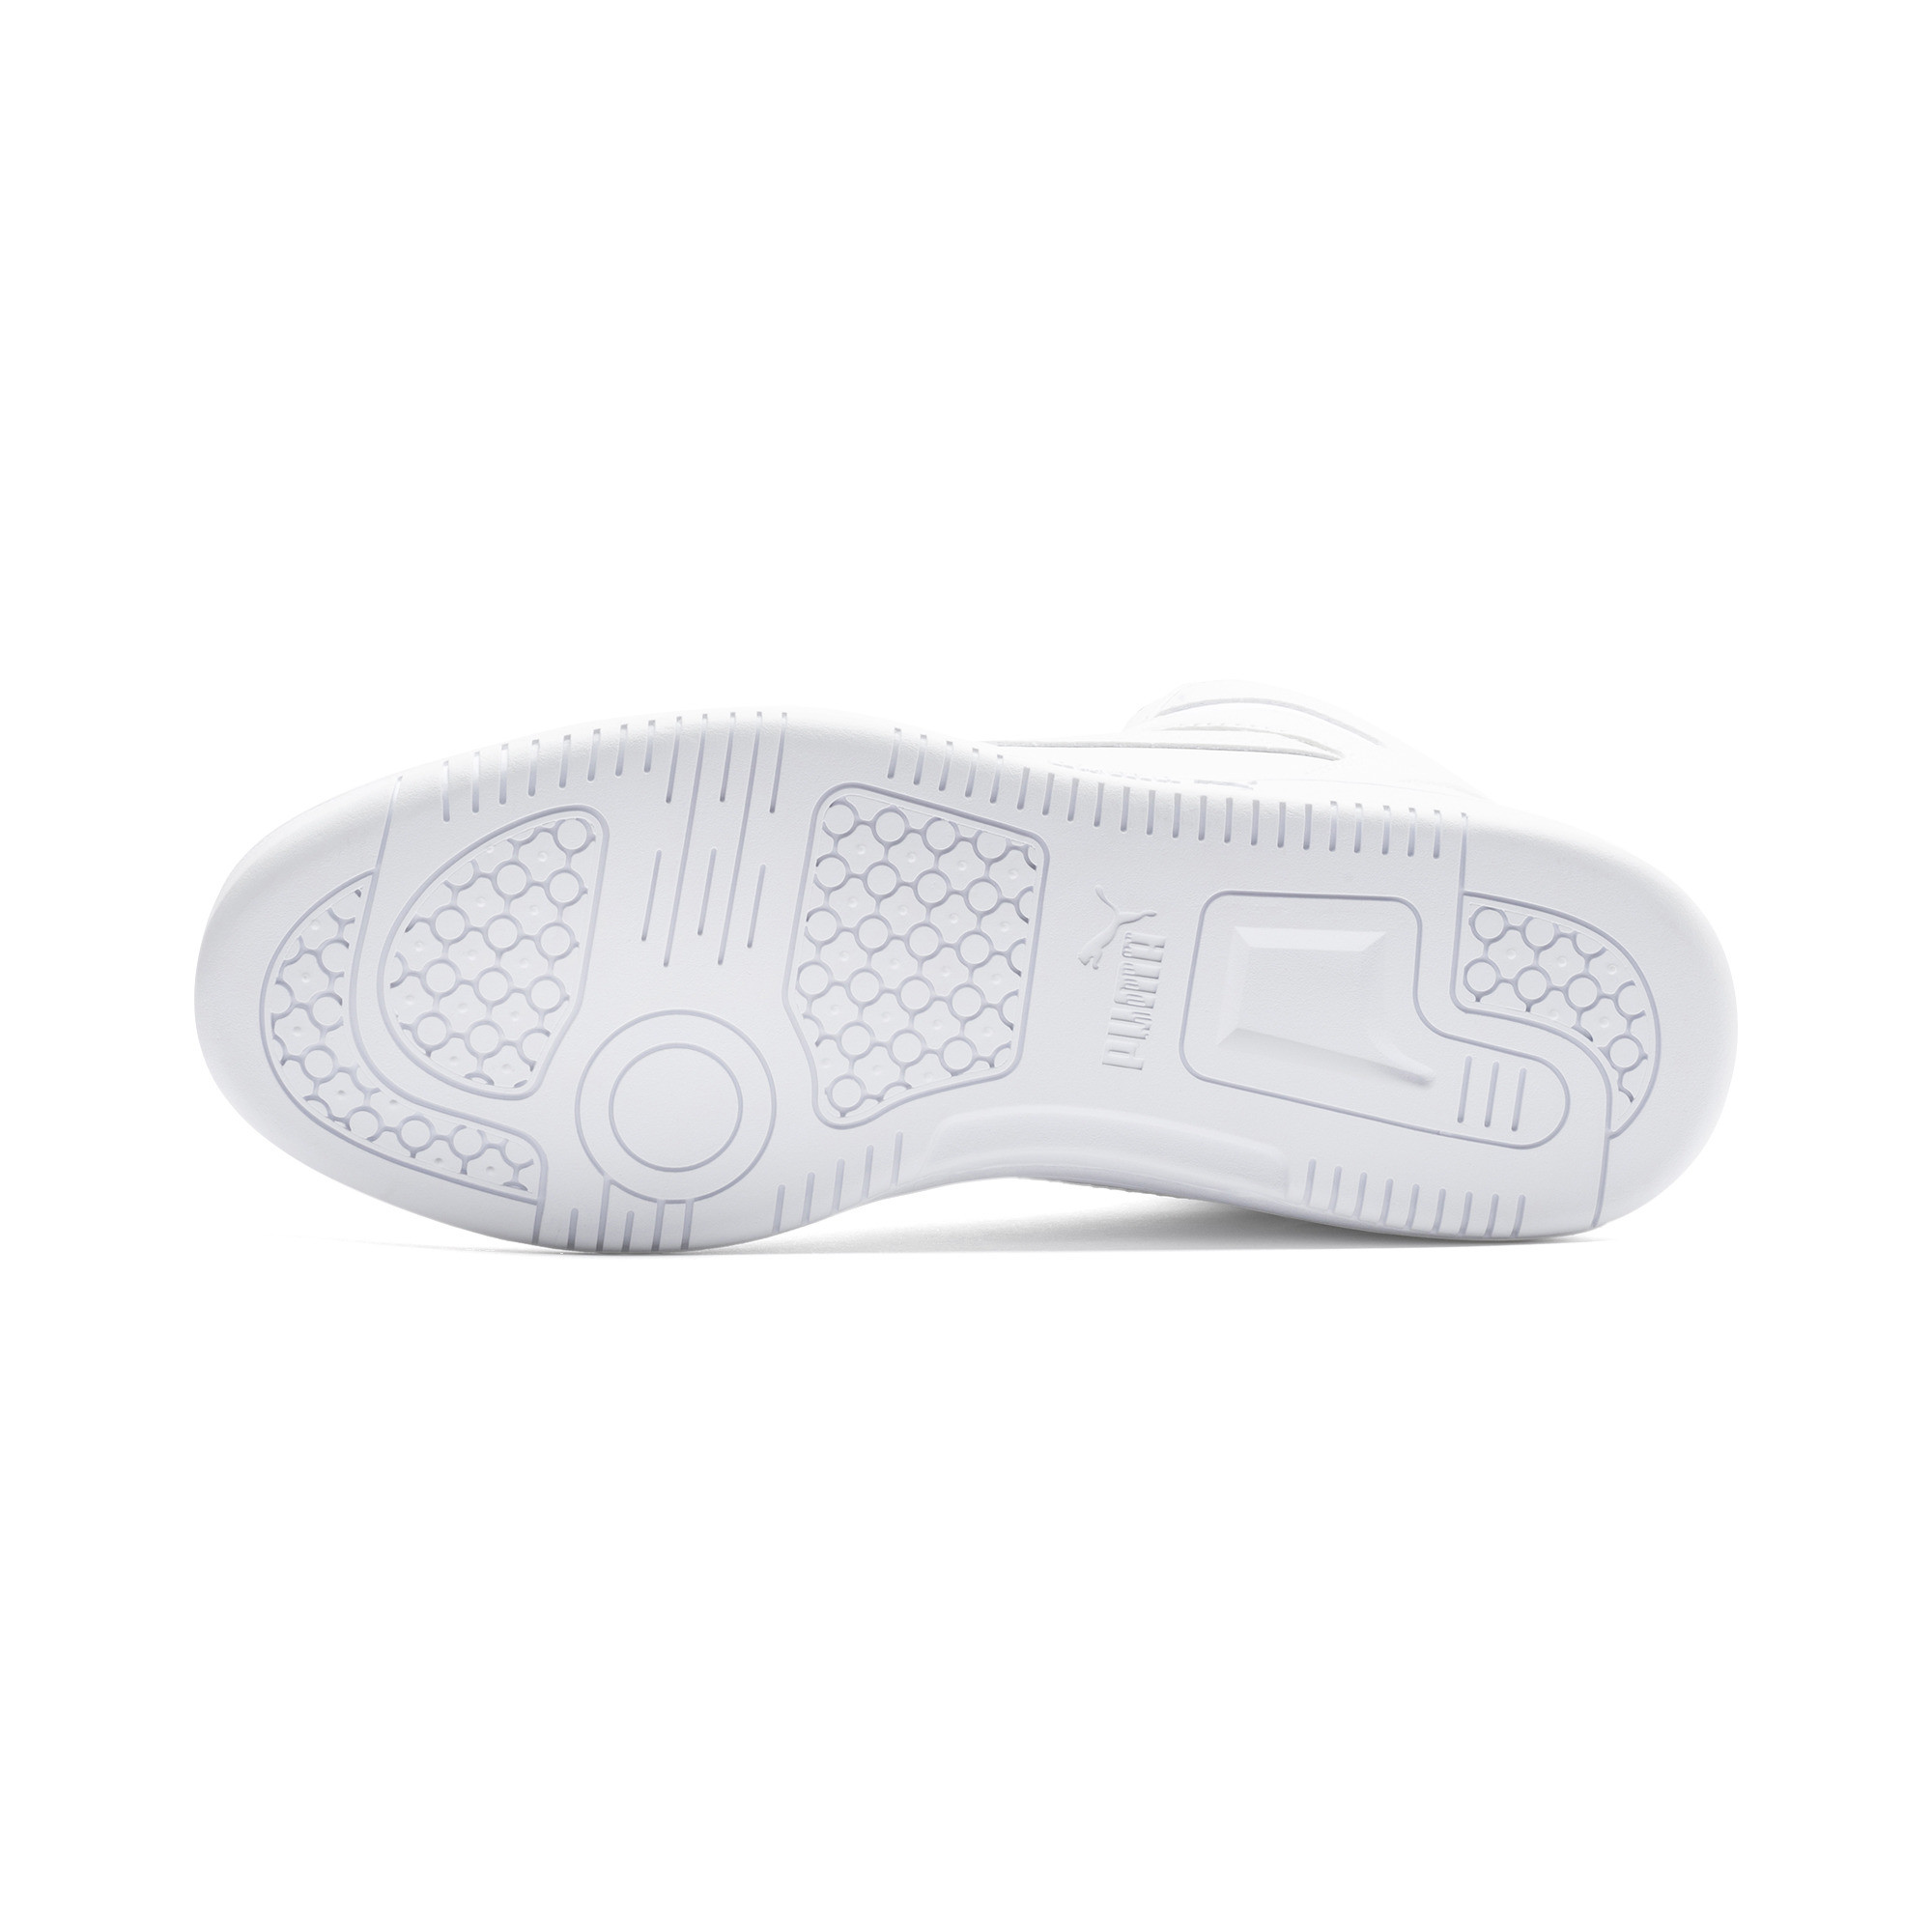 PUMA-PUMA-Rebound-LayUp-Men-039-s-Sneakers-Men-Mid-Boot-Basics thumbnail 18